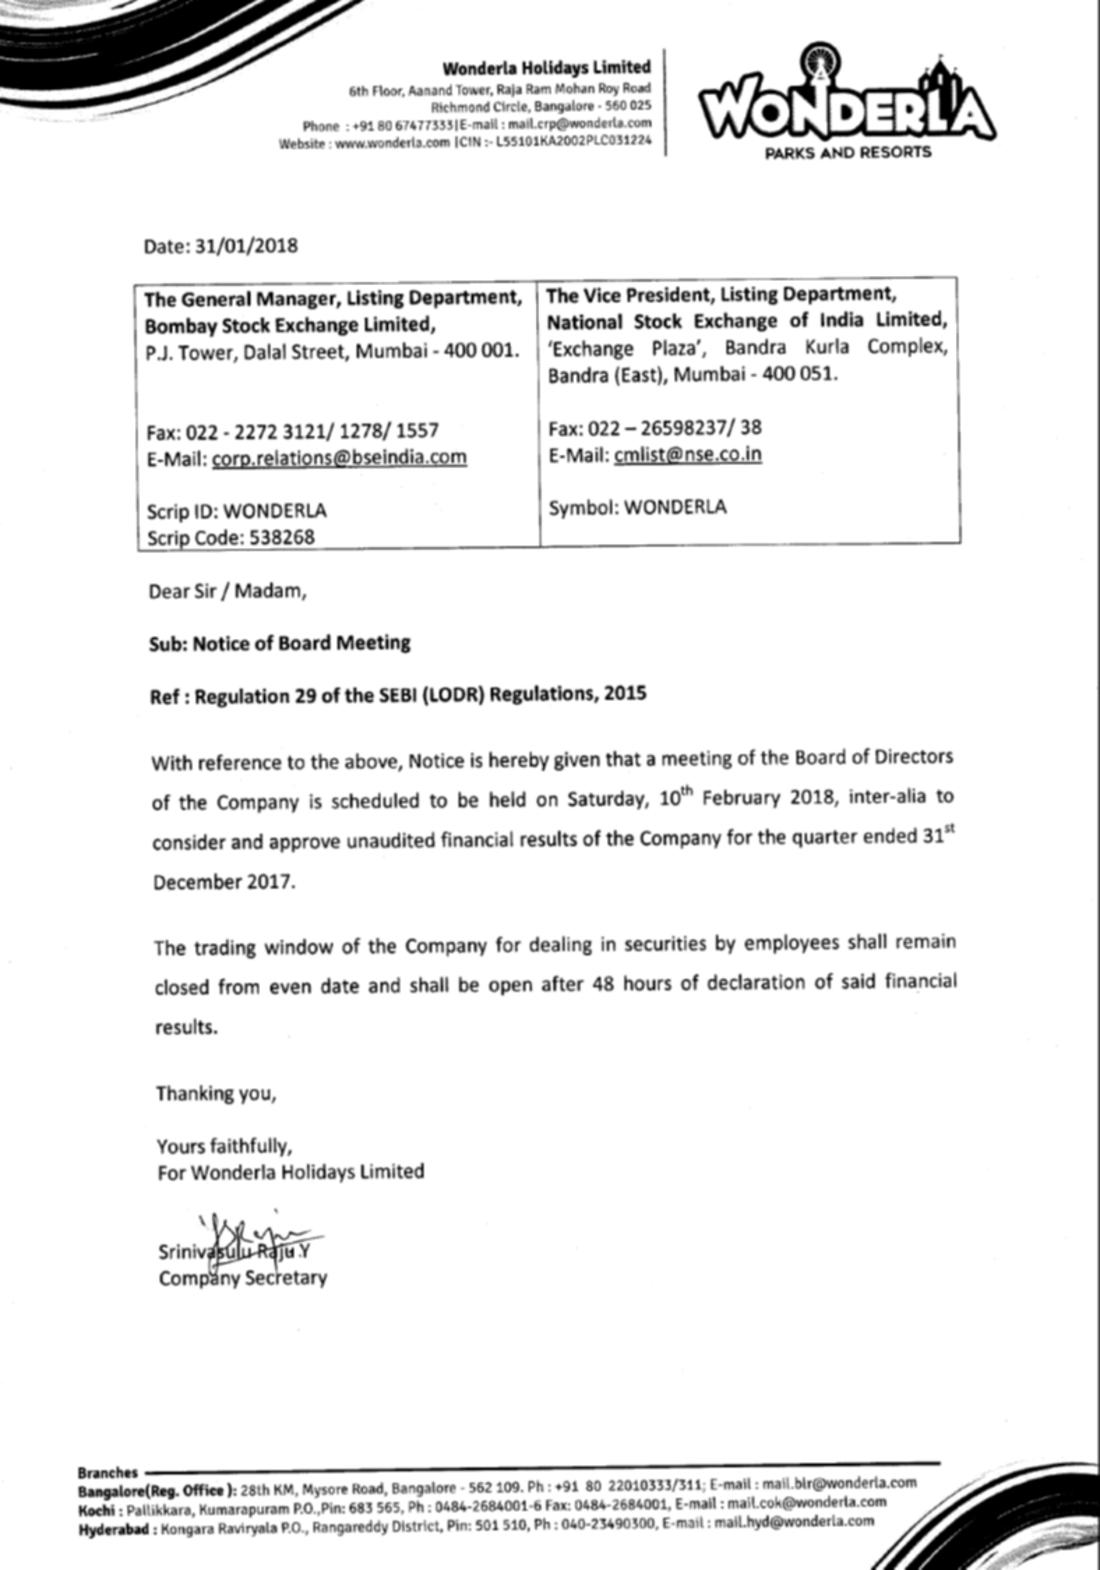 Q3 2017 Board Meeting Notice